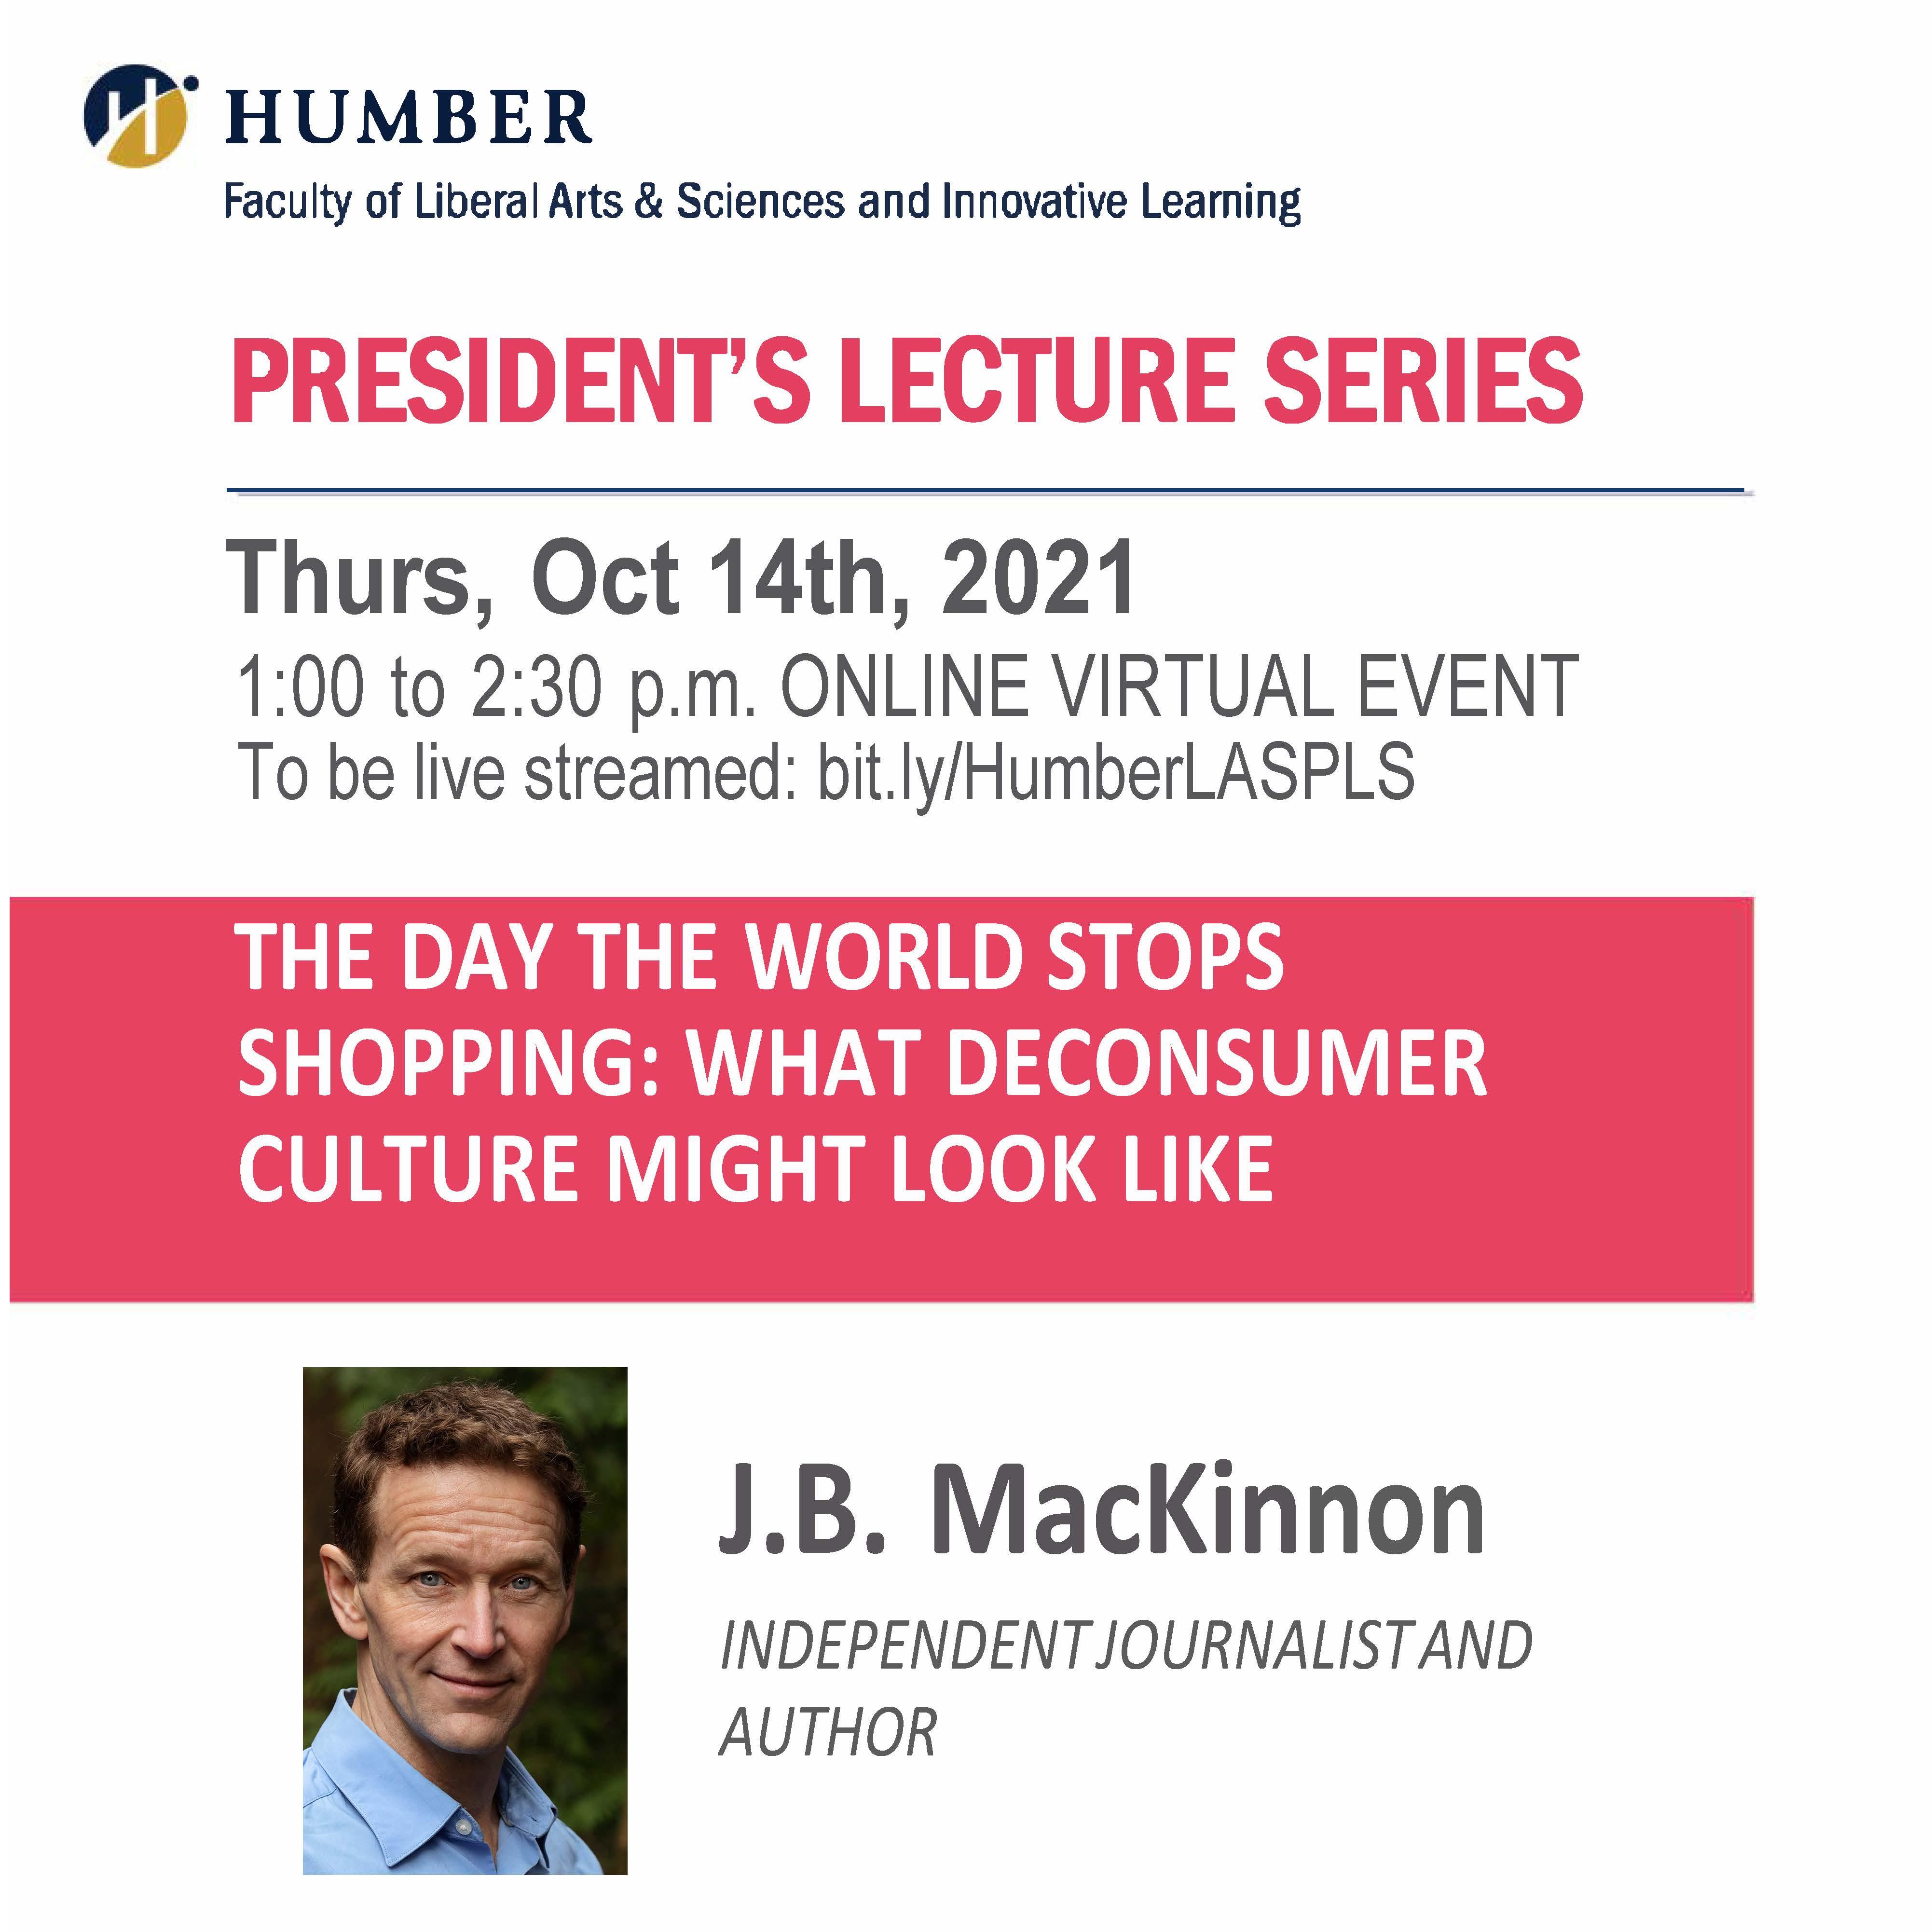 President's Lecture Series: J.B. MacKinnon